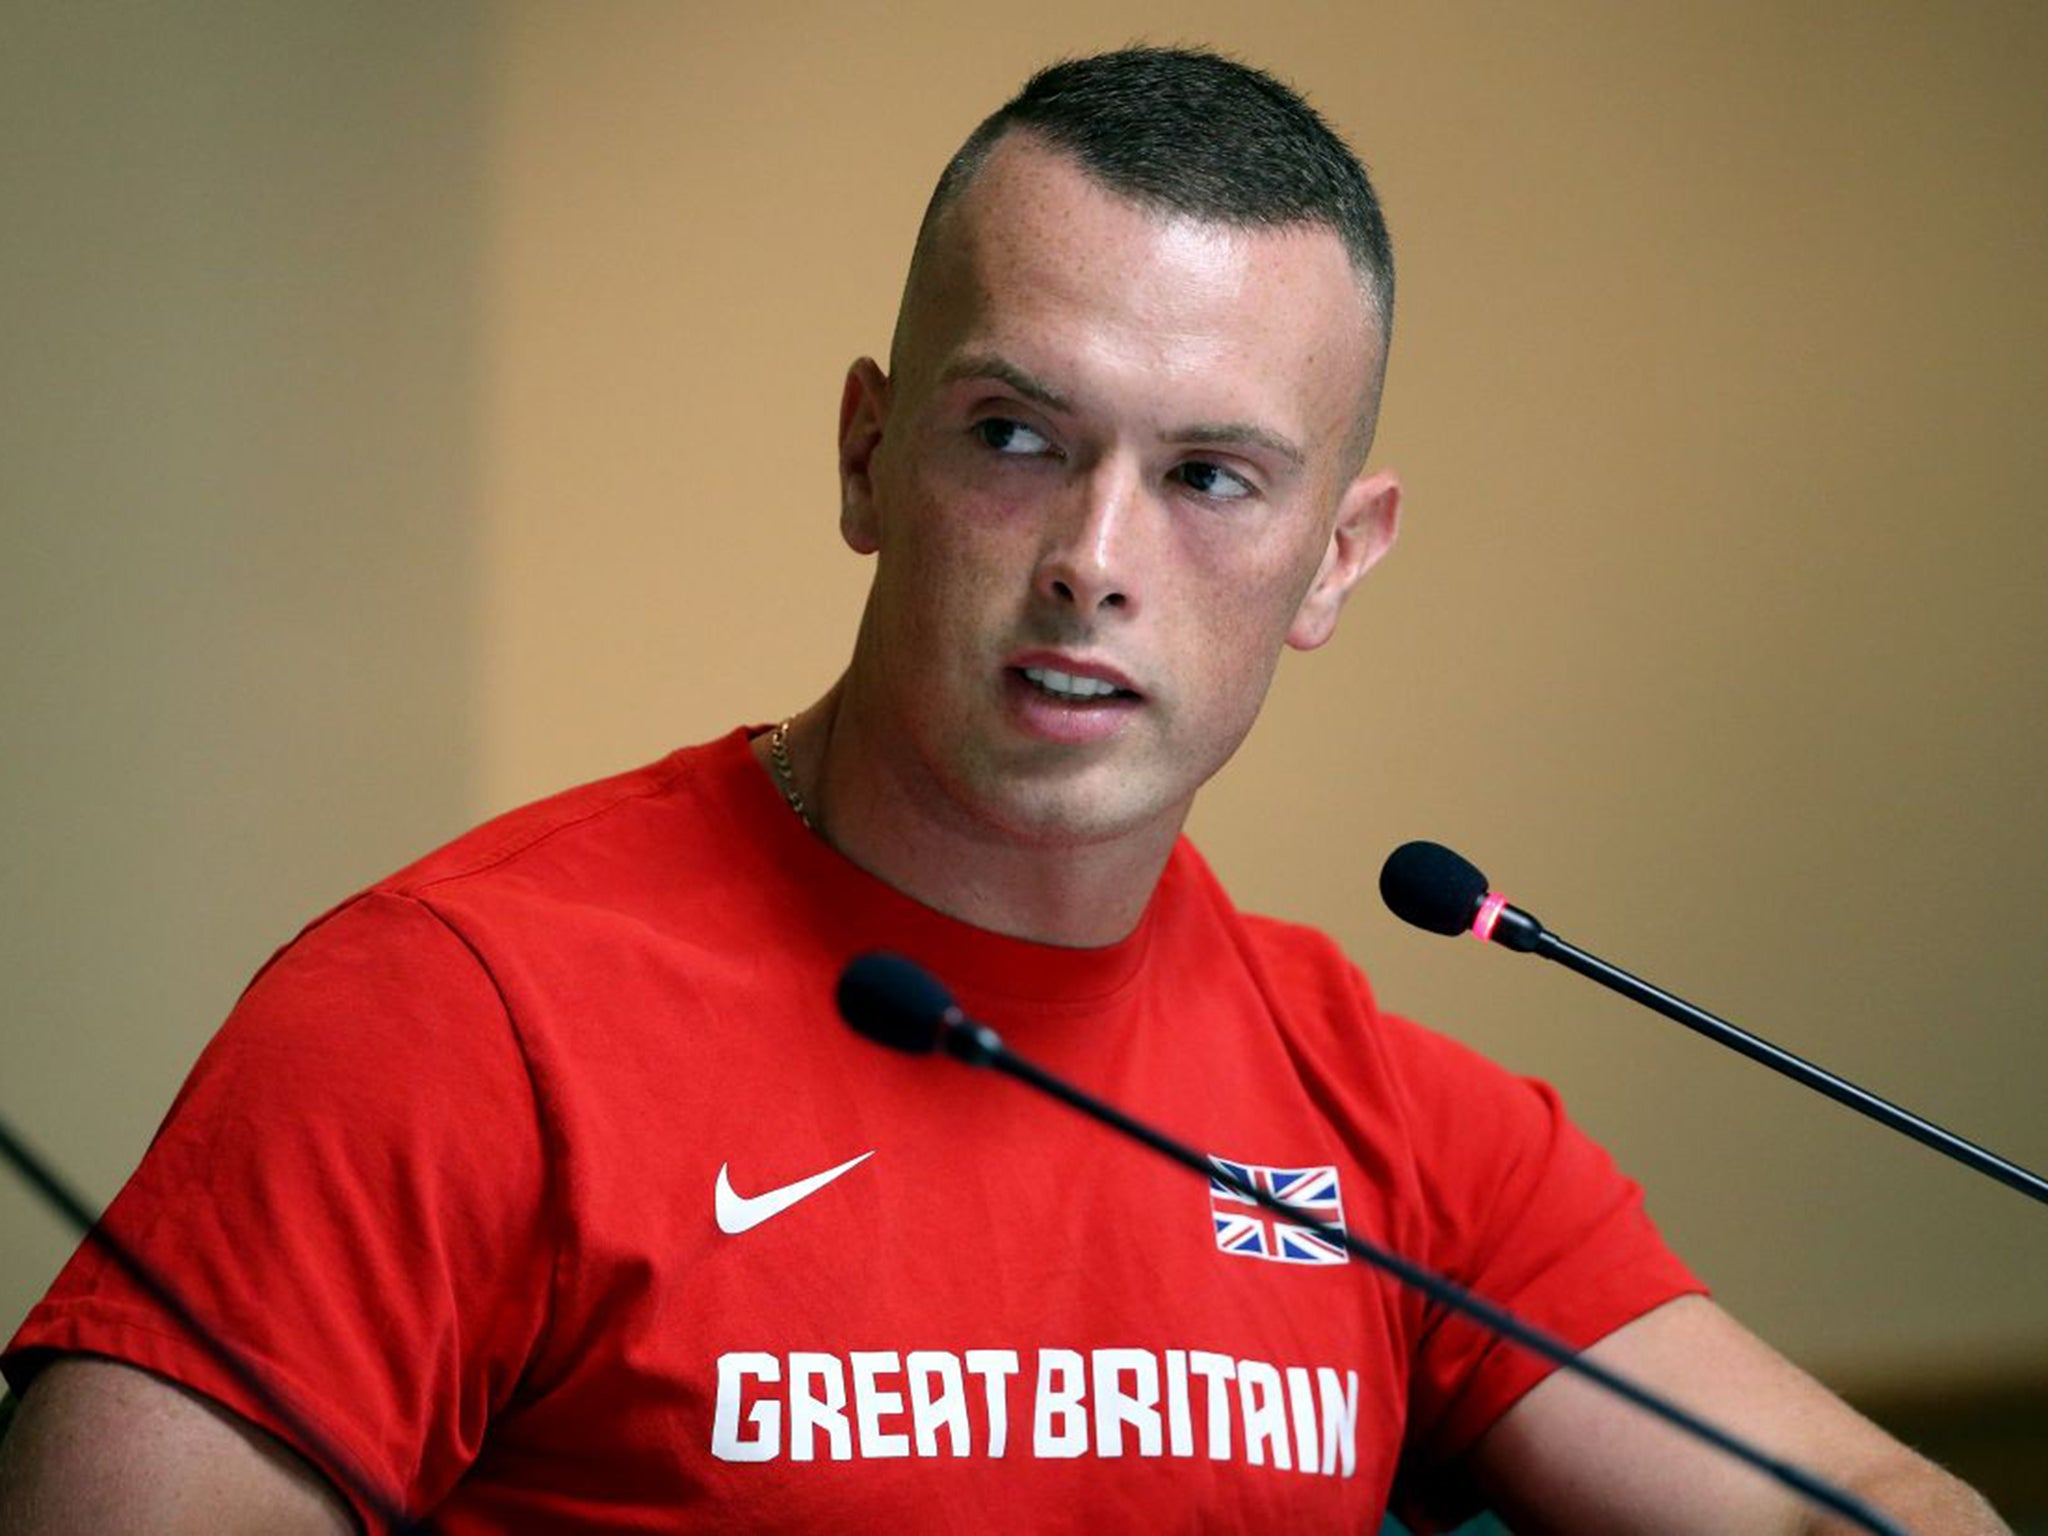 World Athletics Championships 2019: Sprinter Richard Kilty to captain Great Britain in Doha